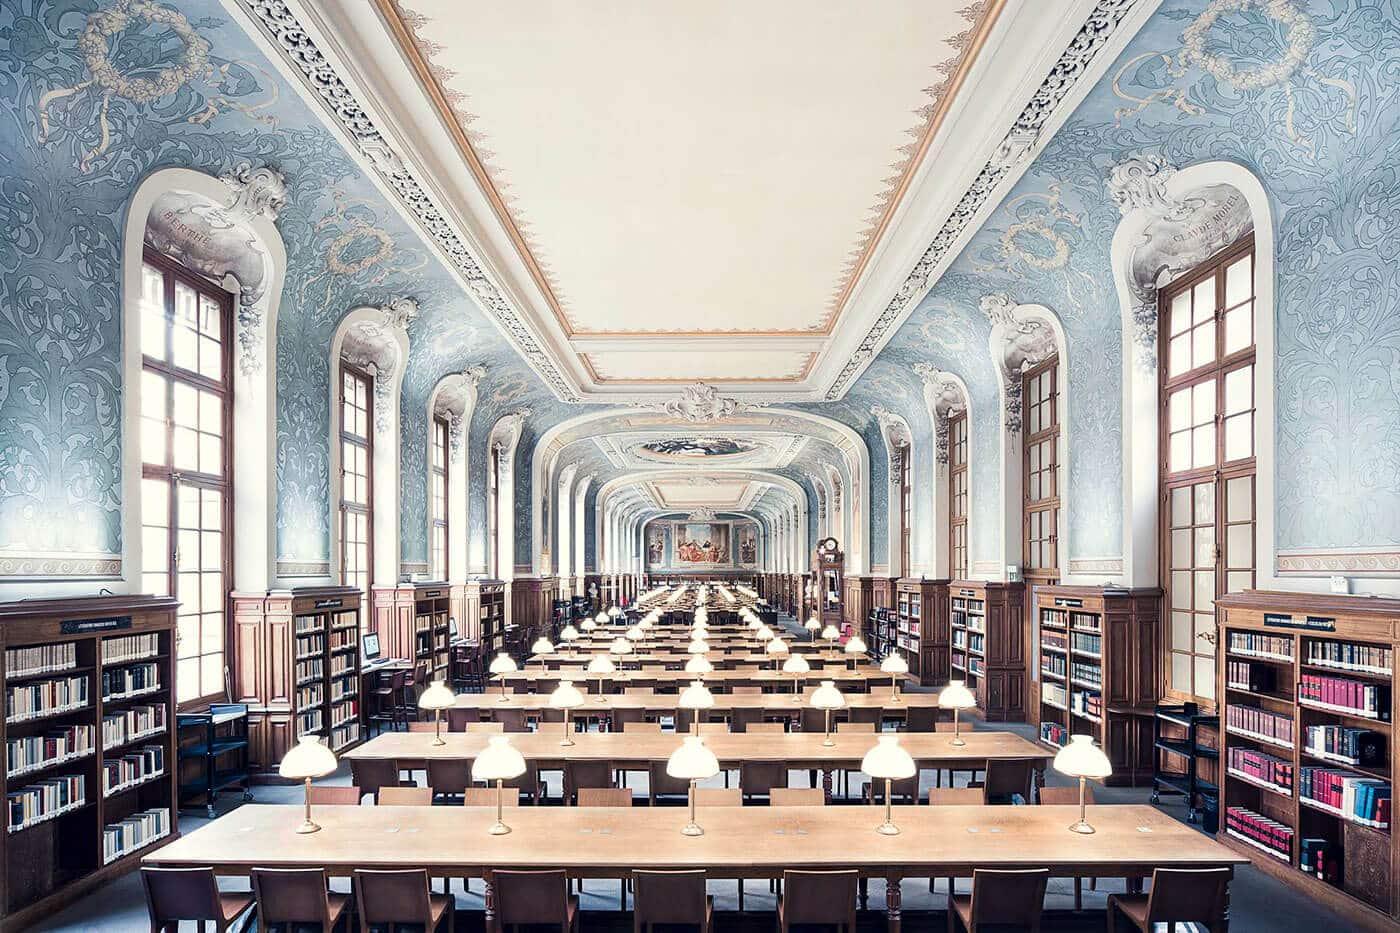 Библиотека Сорбонны, зал Жаклин де Рамиле, Париж, 1897